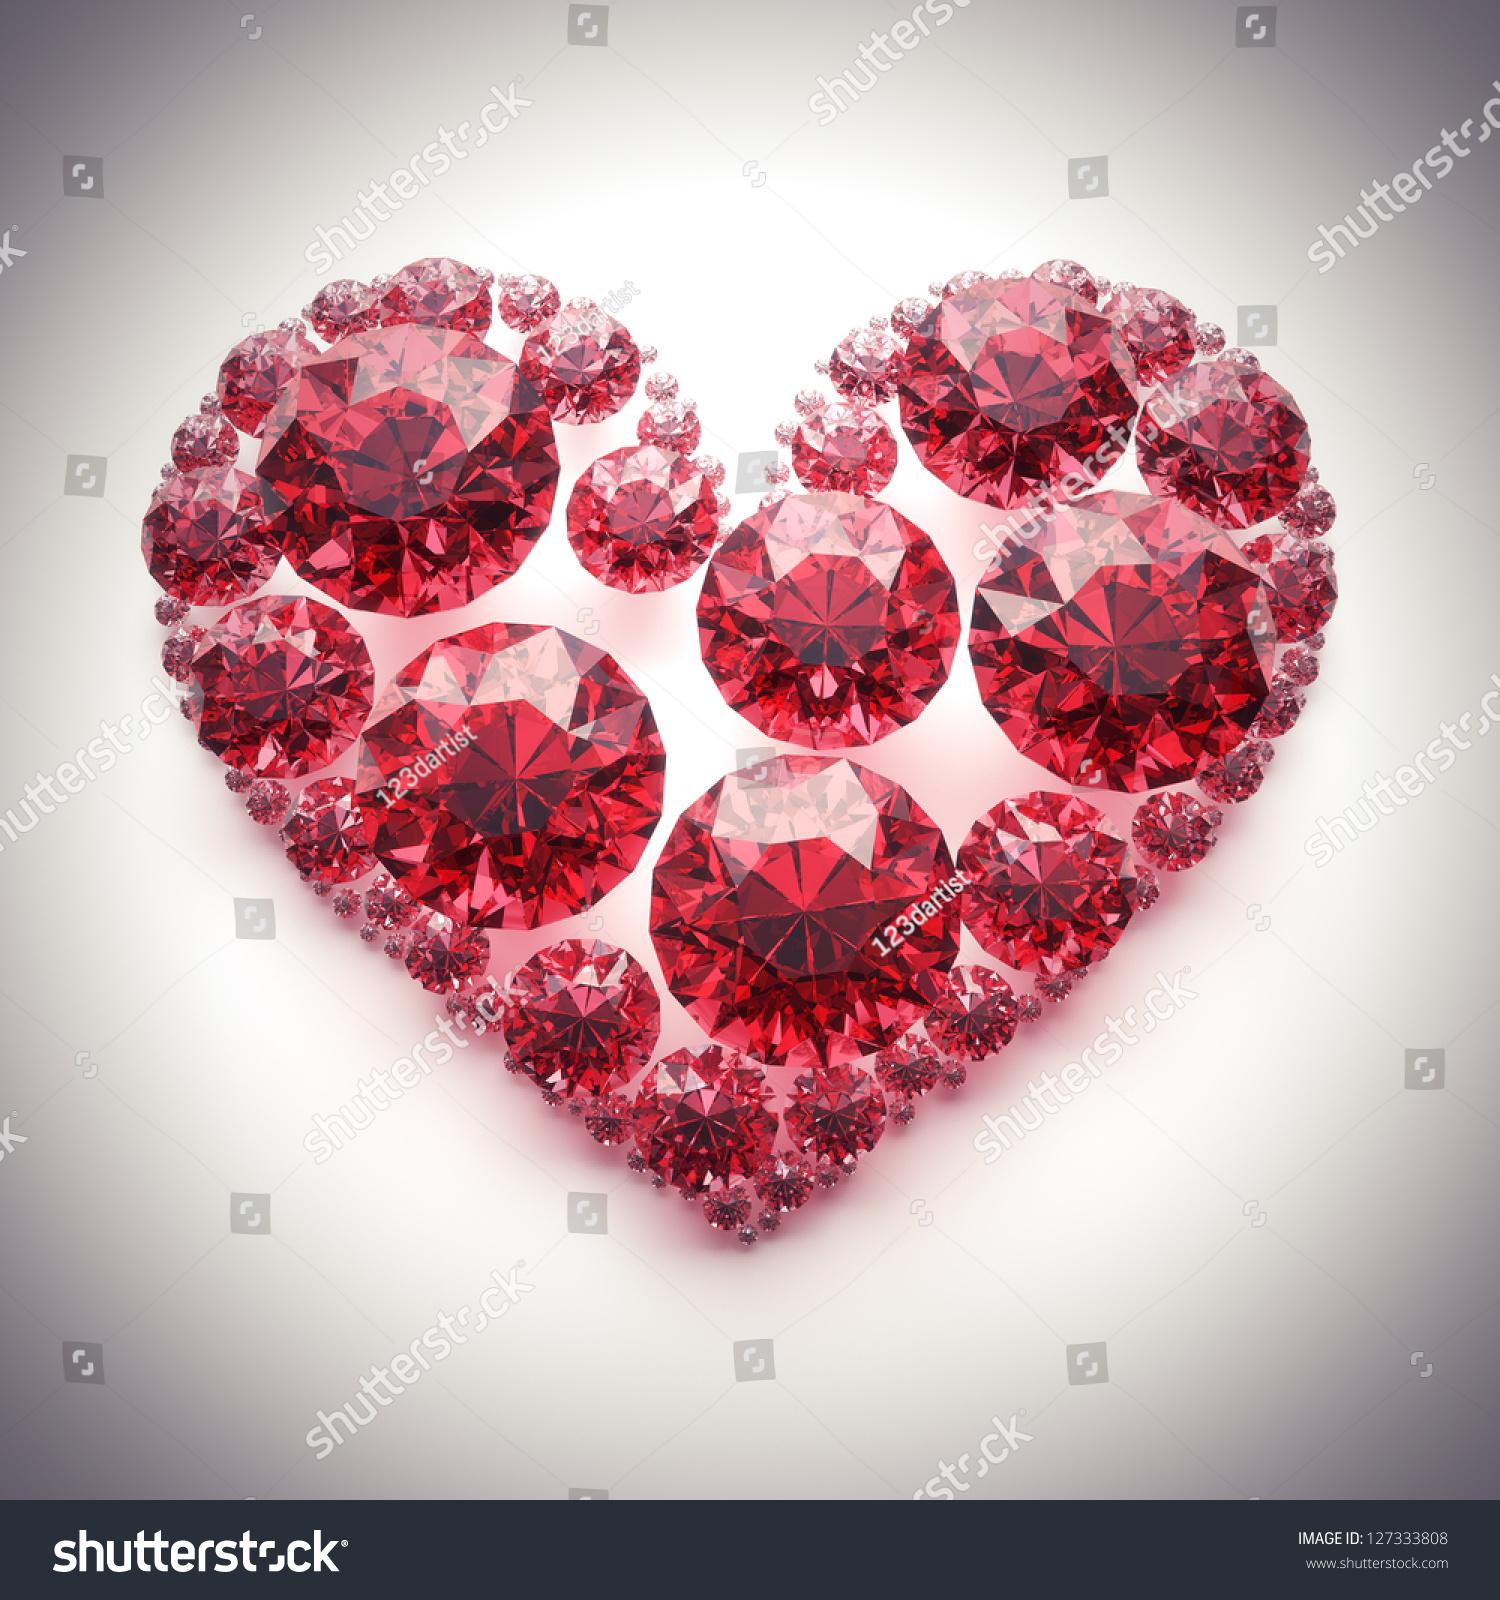 Red diamond heart photo